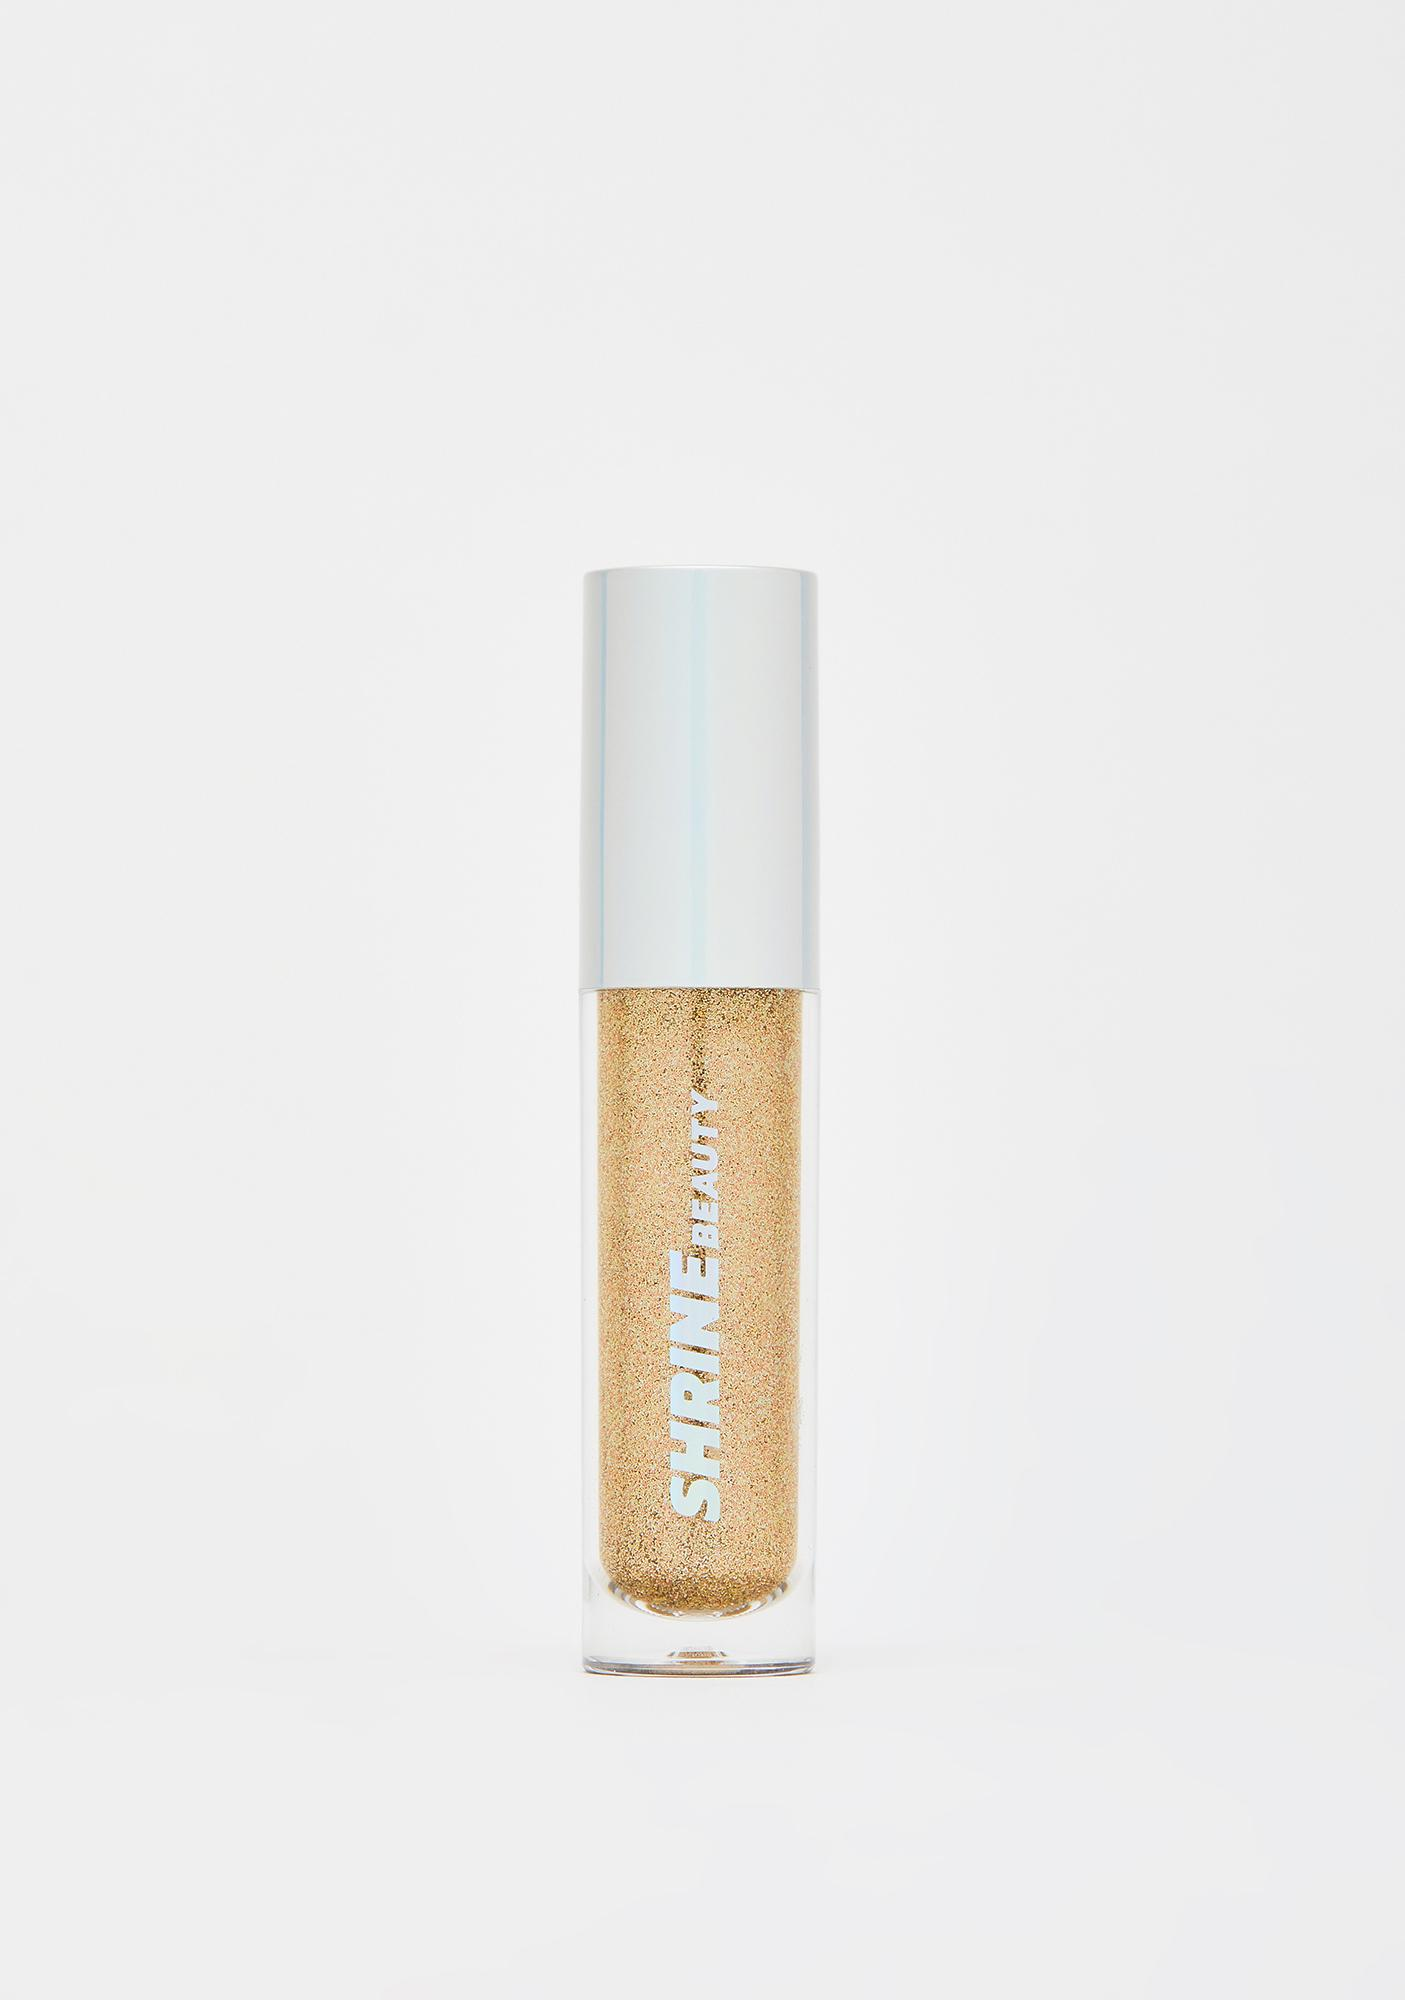 Shrine Gold Glitter Lids Liquid Eyeshadow